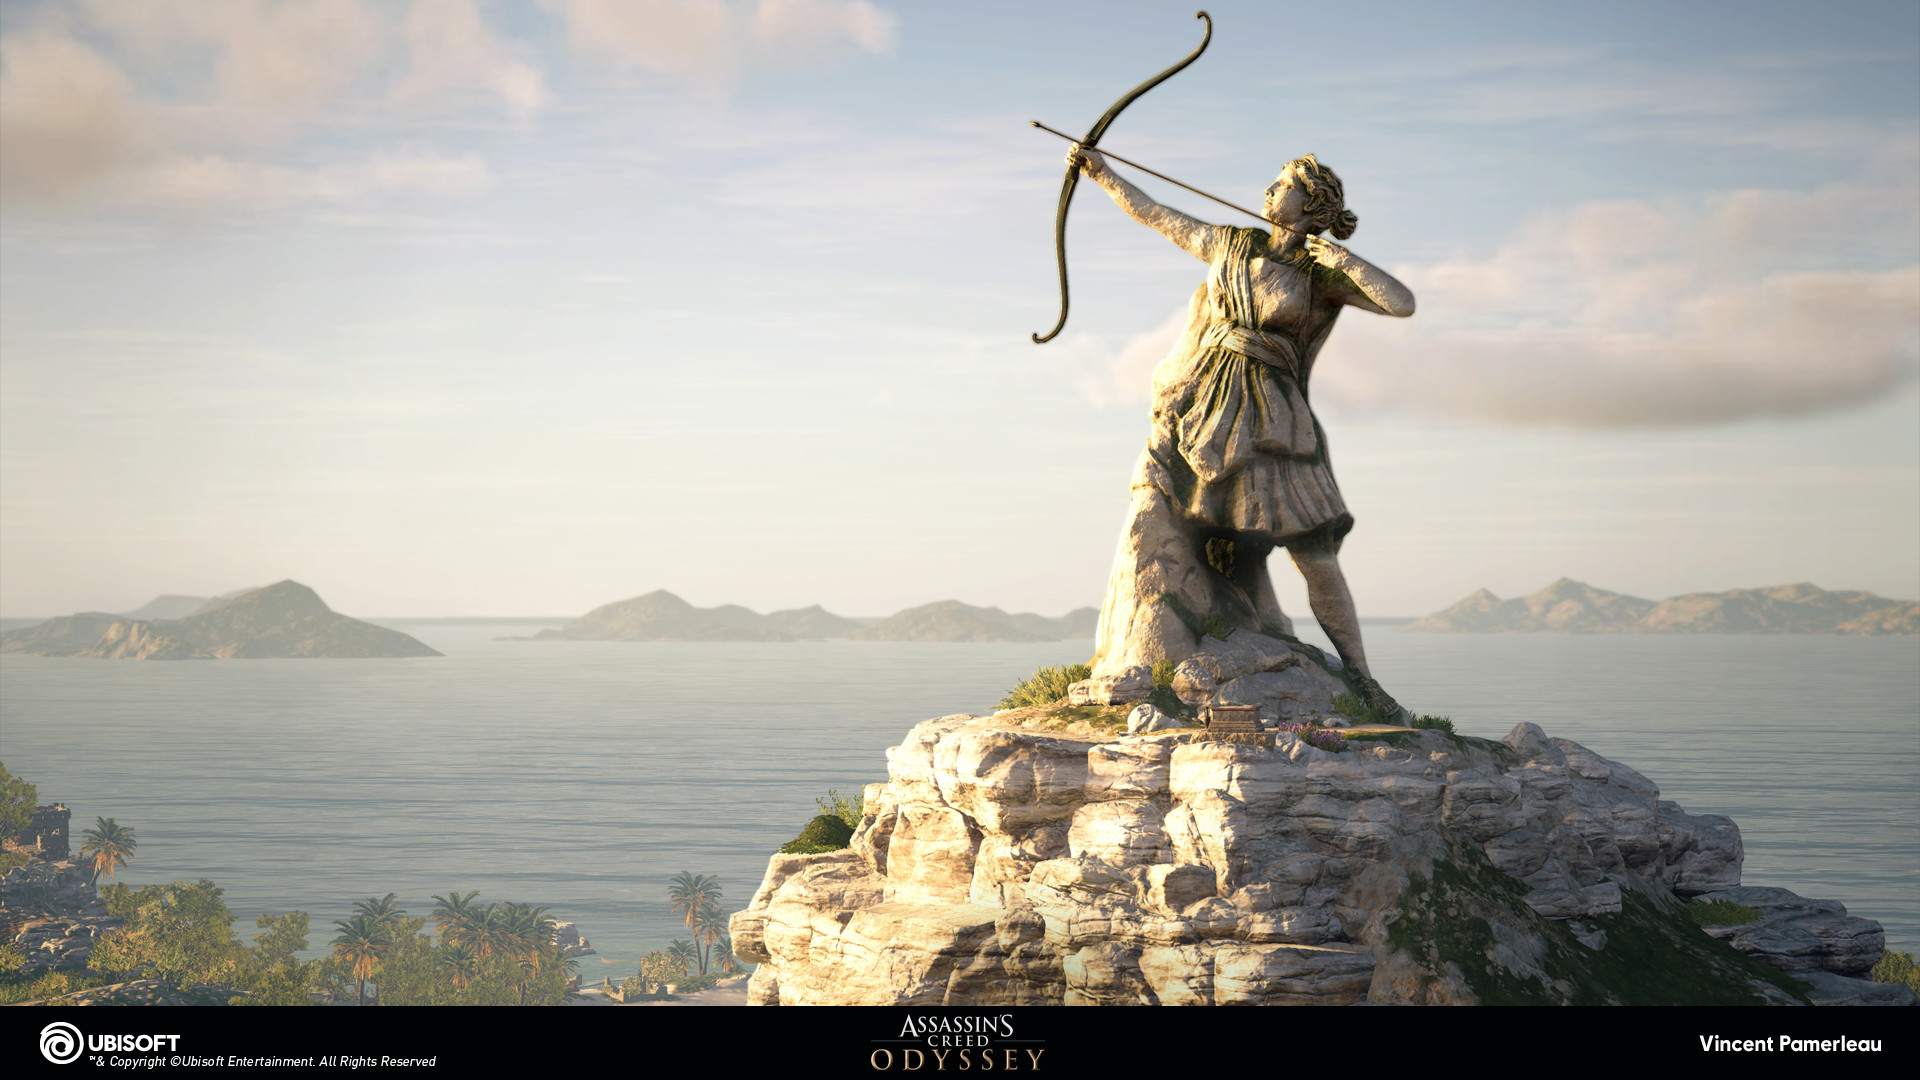 Artstation Assassin S Creed Odyssey Statues Vincent Pamerleau